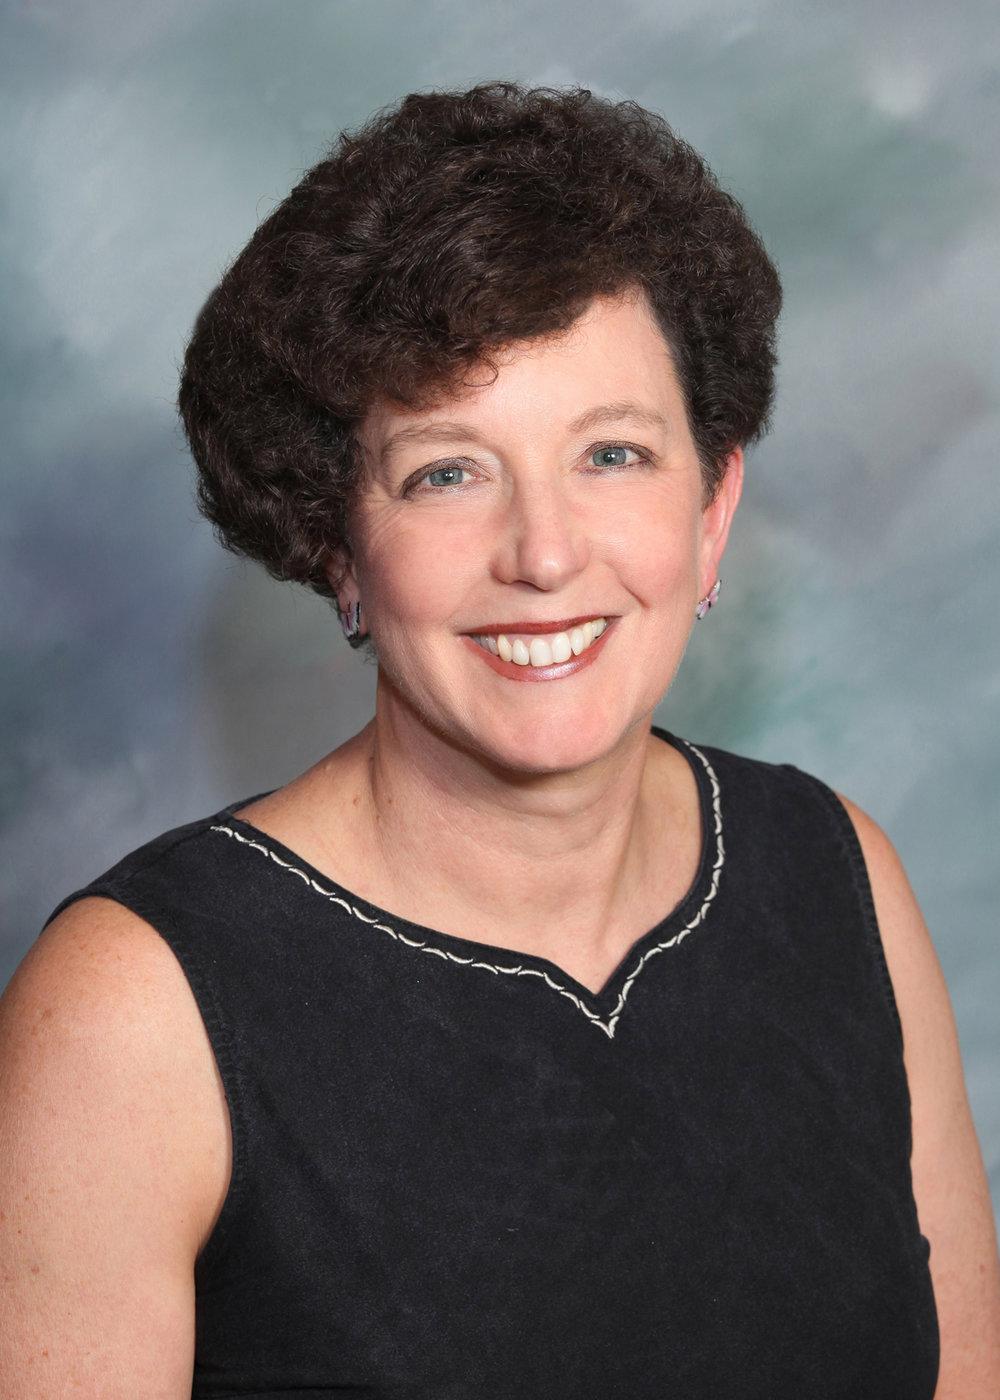 Pam Marrone, CEO, Marrone Bio Innovations